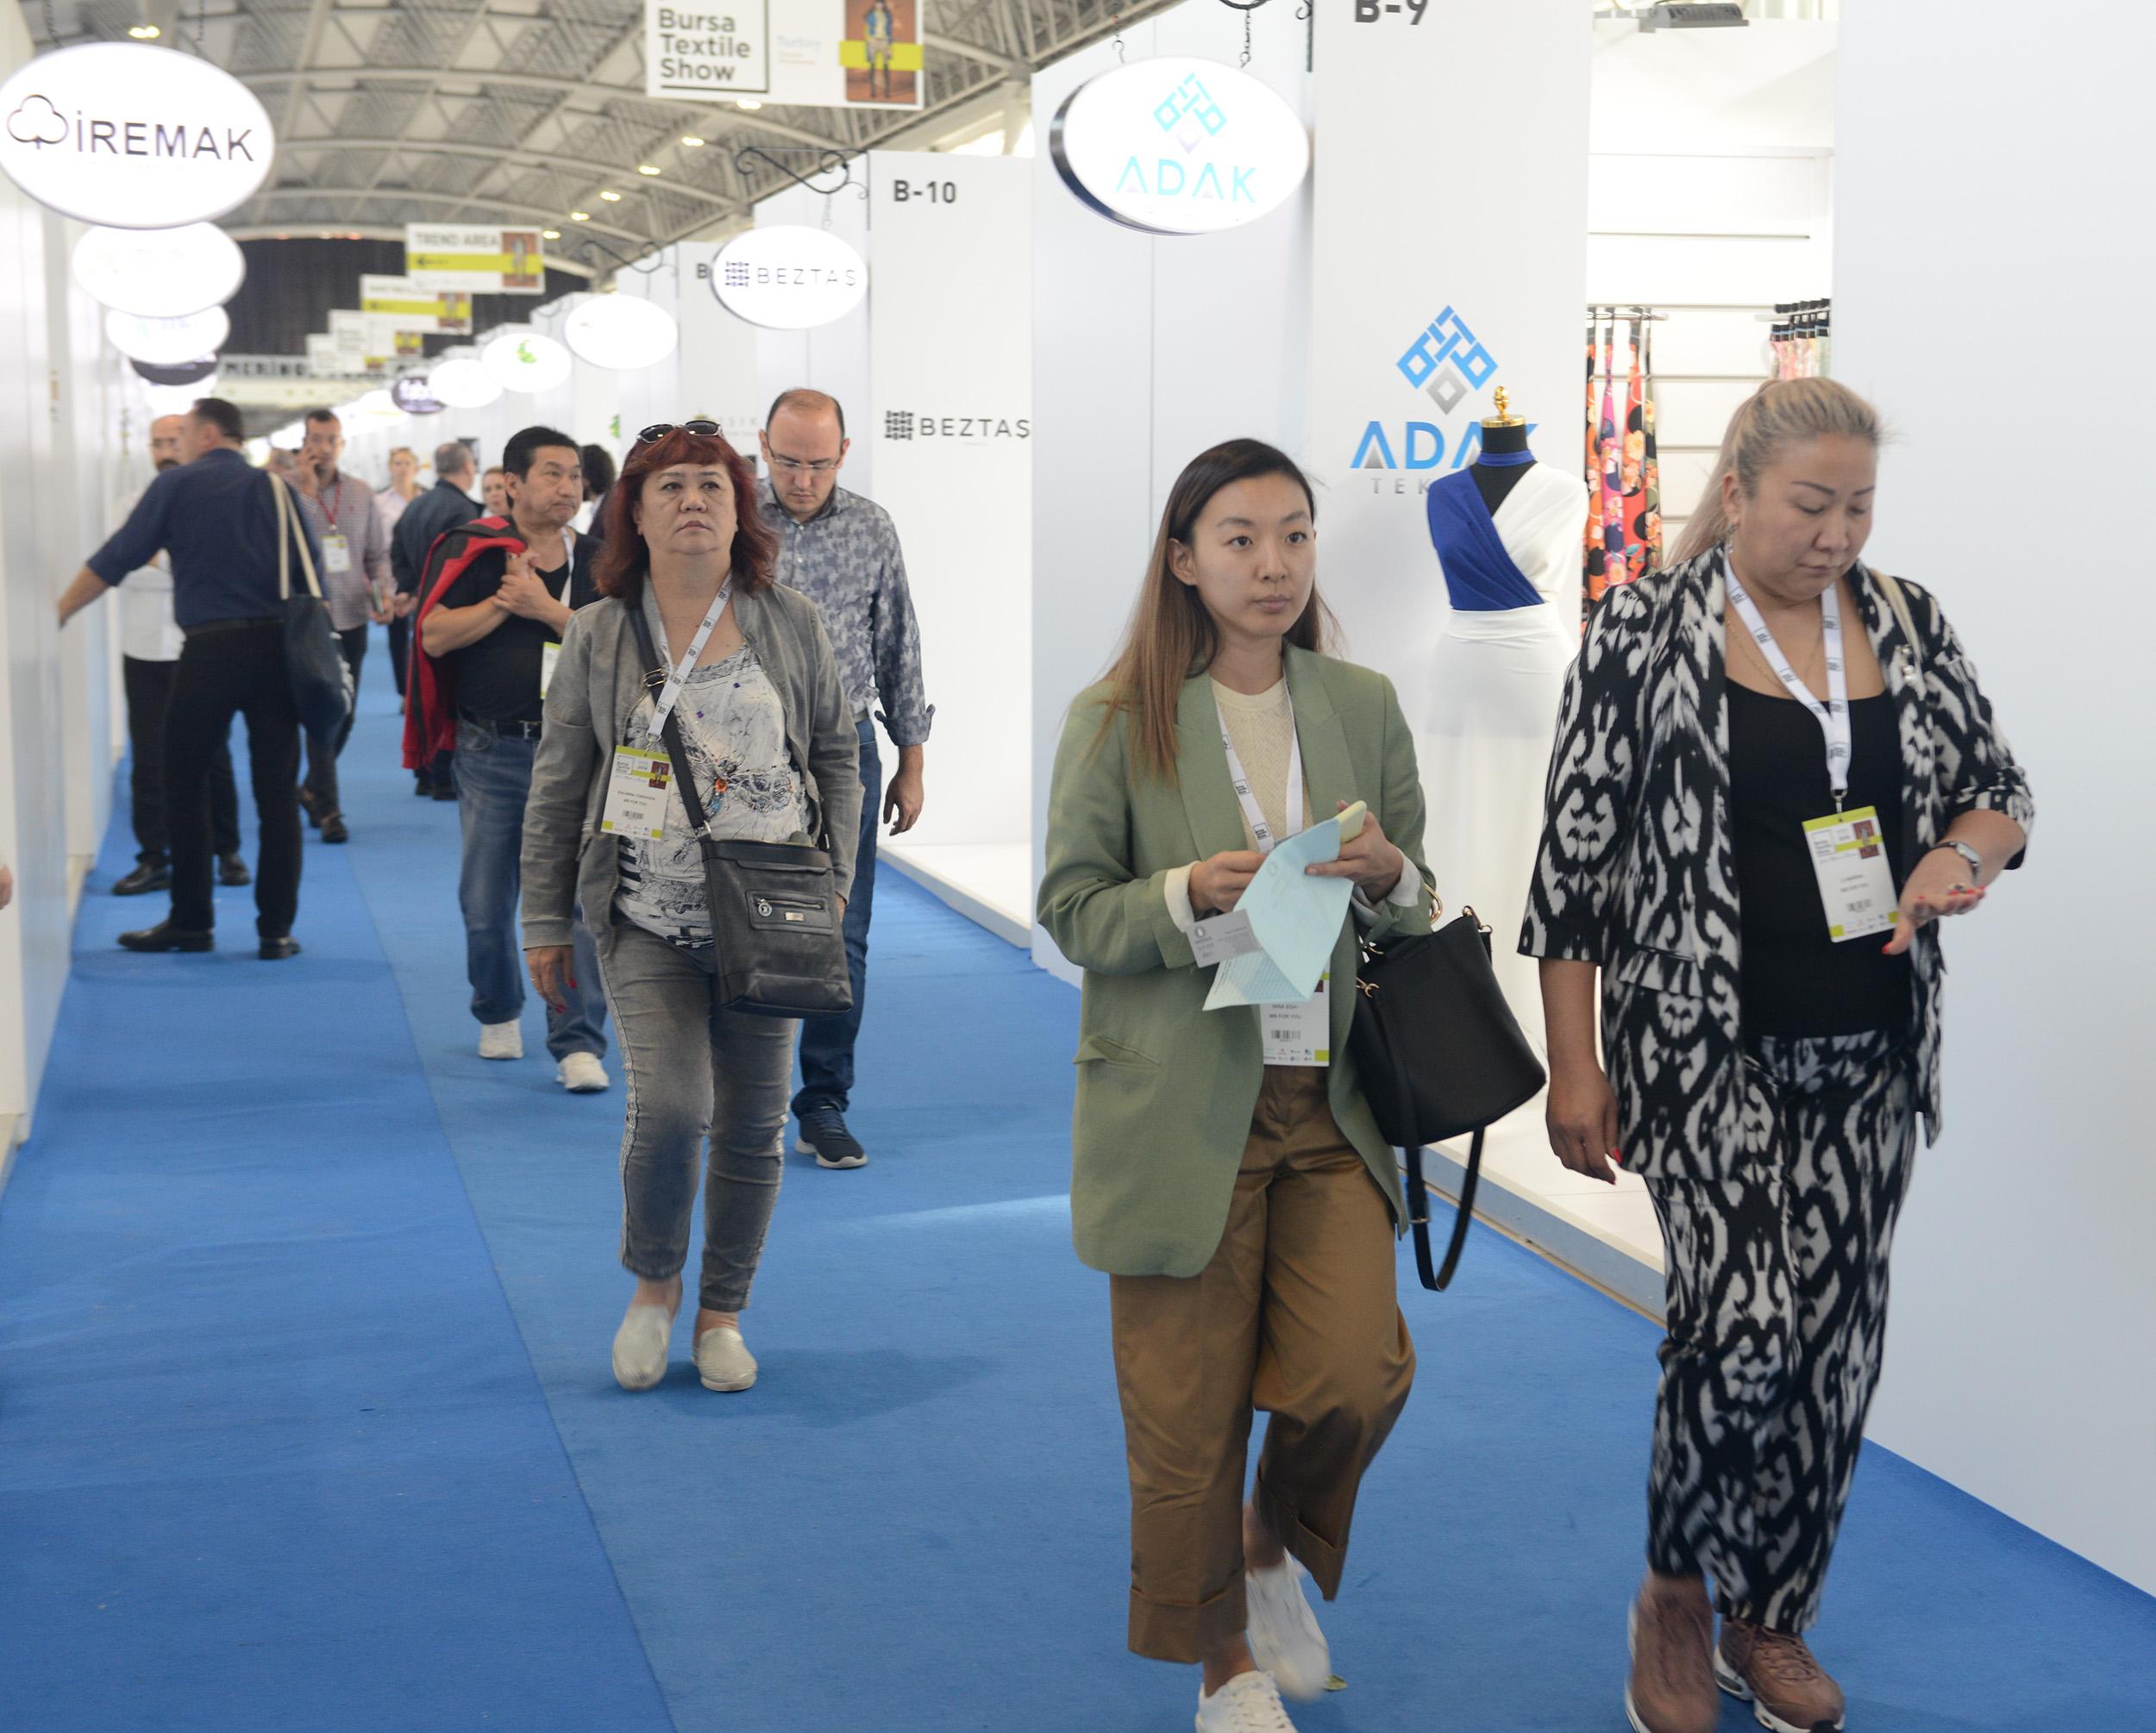 Bursa Textile Show Breaks Record